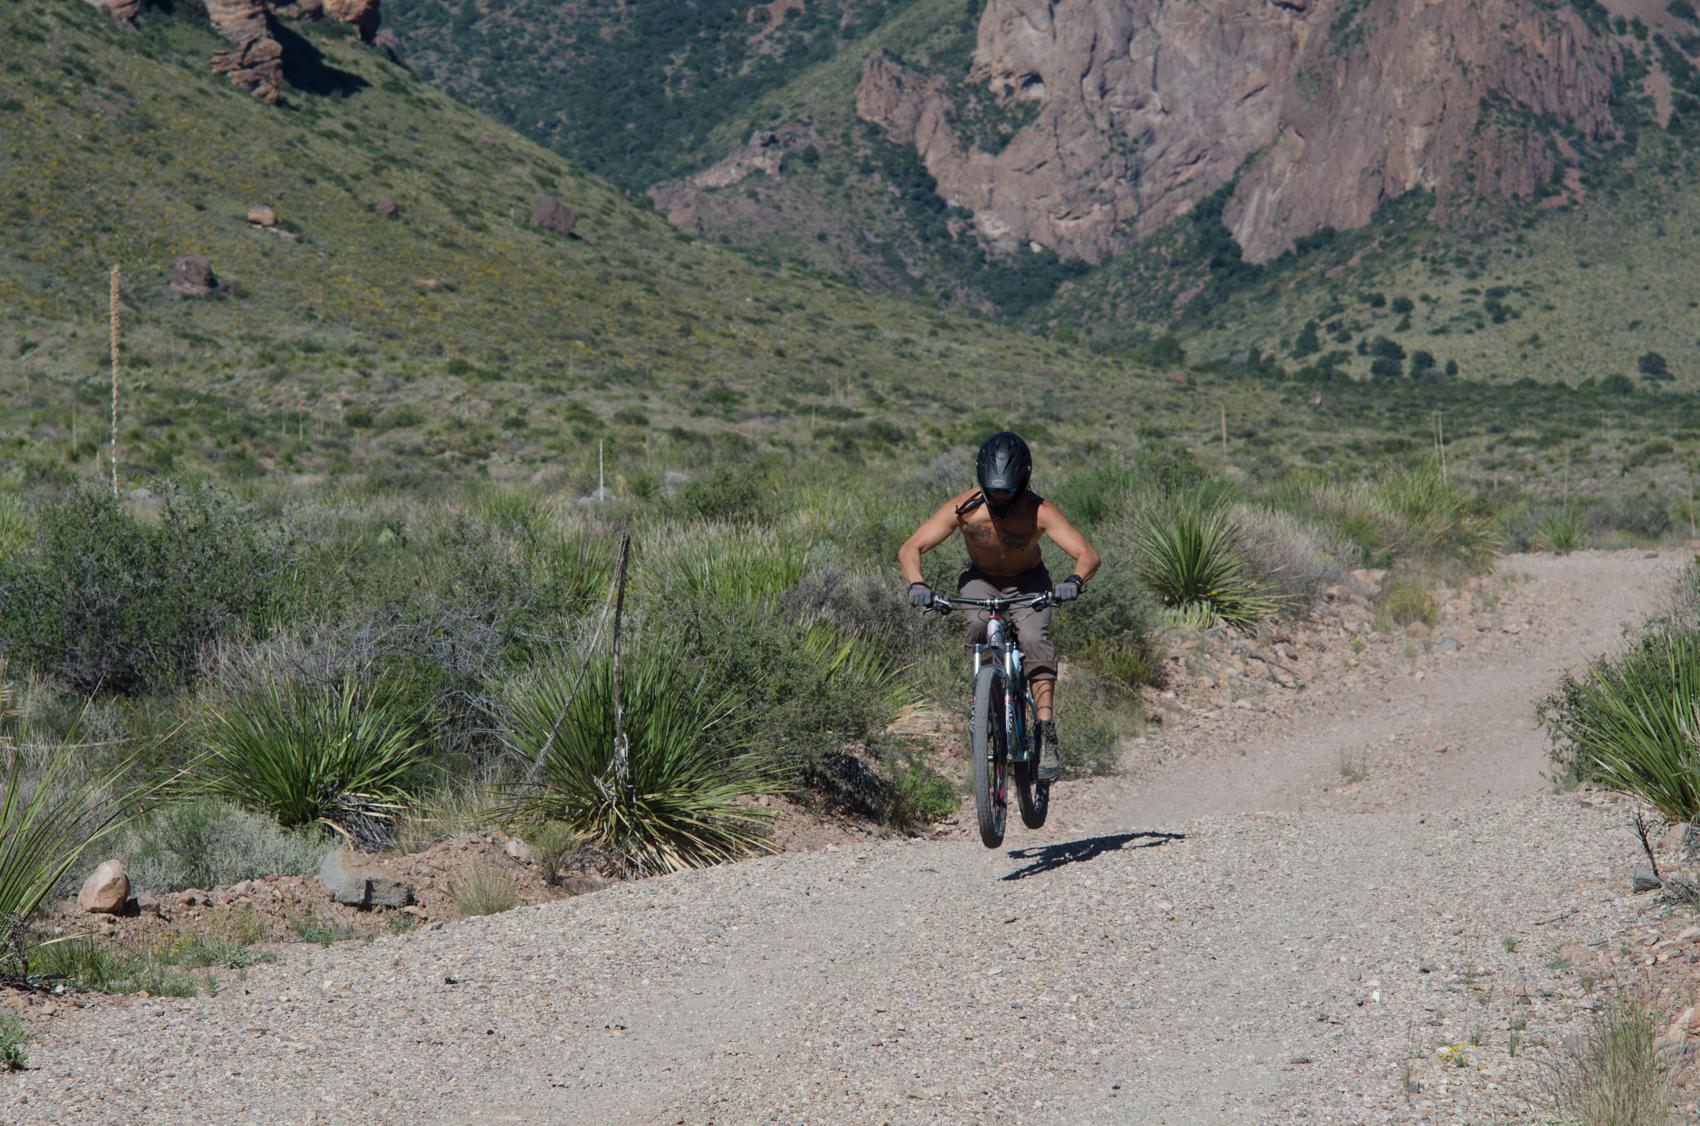 Mountain biking in big bend national park-leh cycling goods-19.jpg